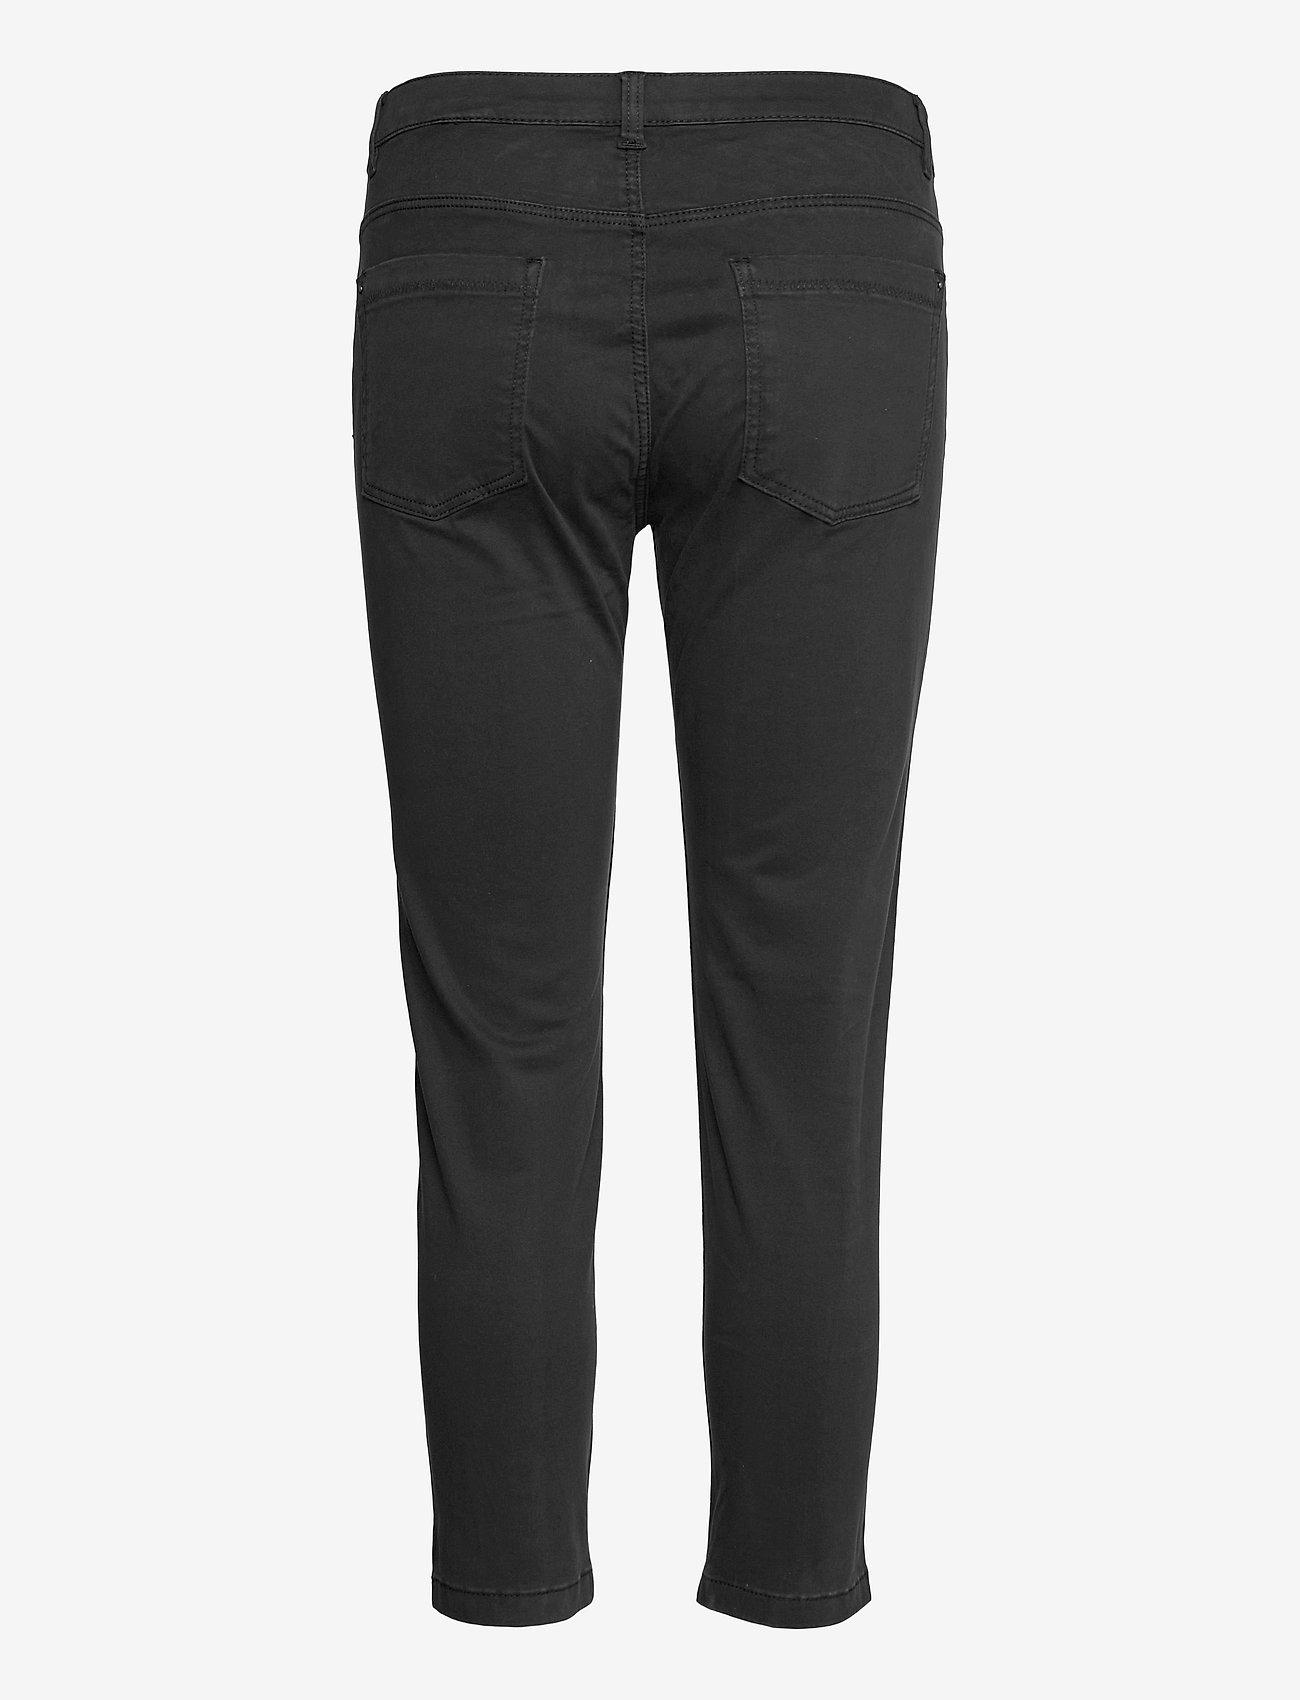 Esprit Casual - Pants woven - slim fit bukser - black - 1